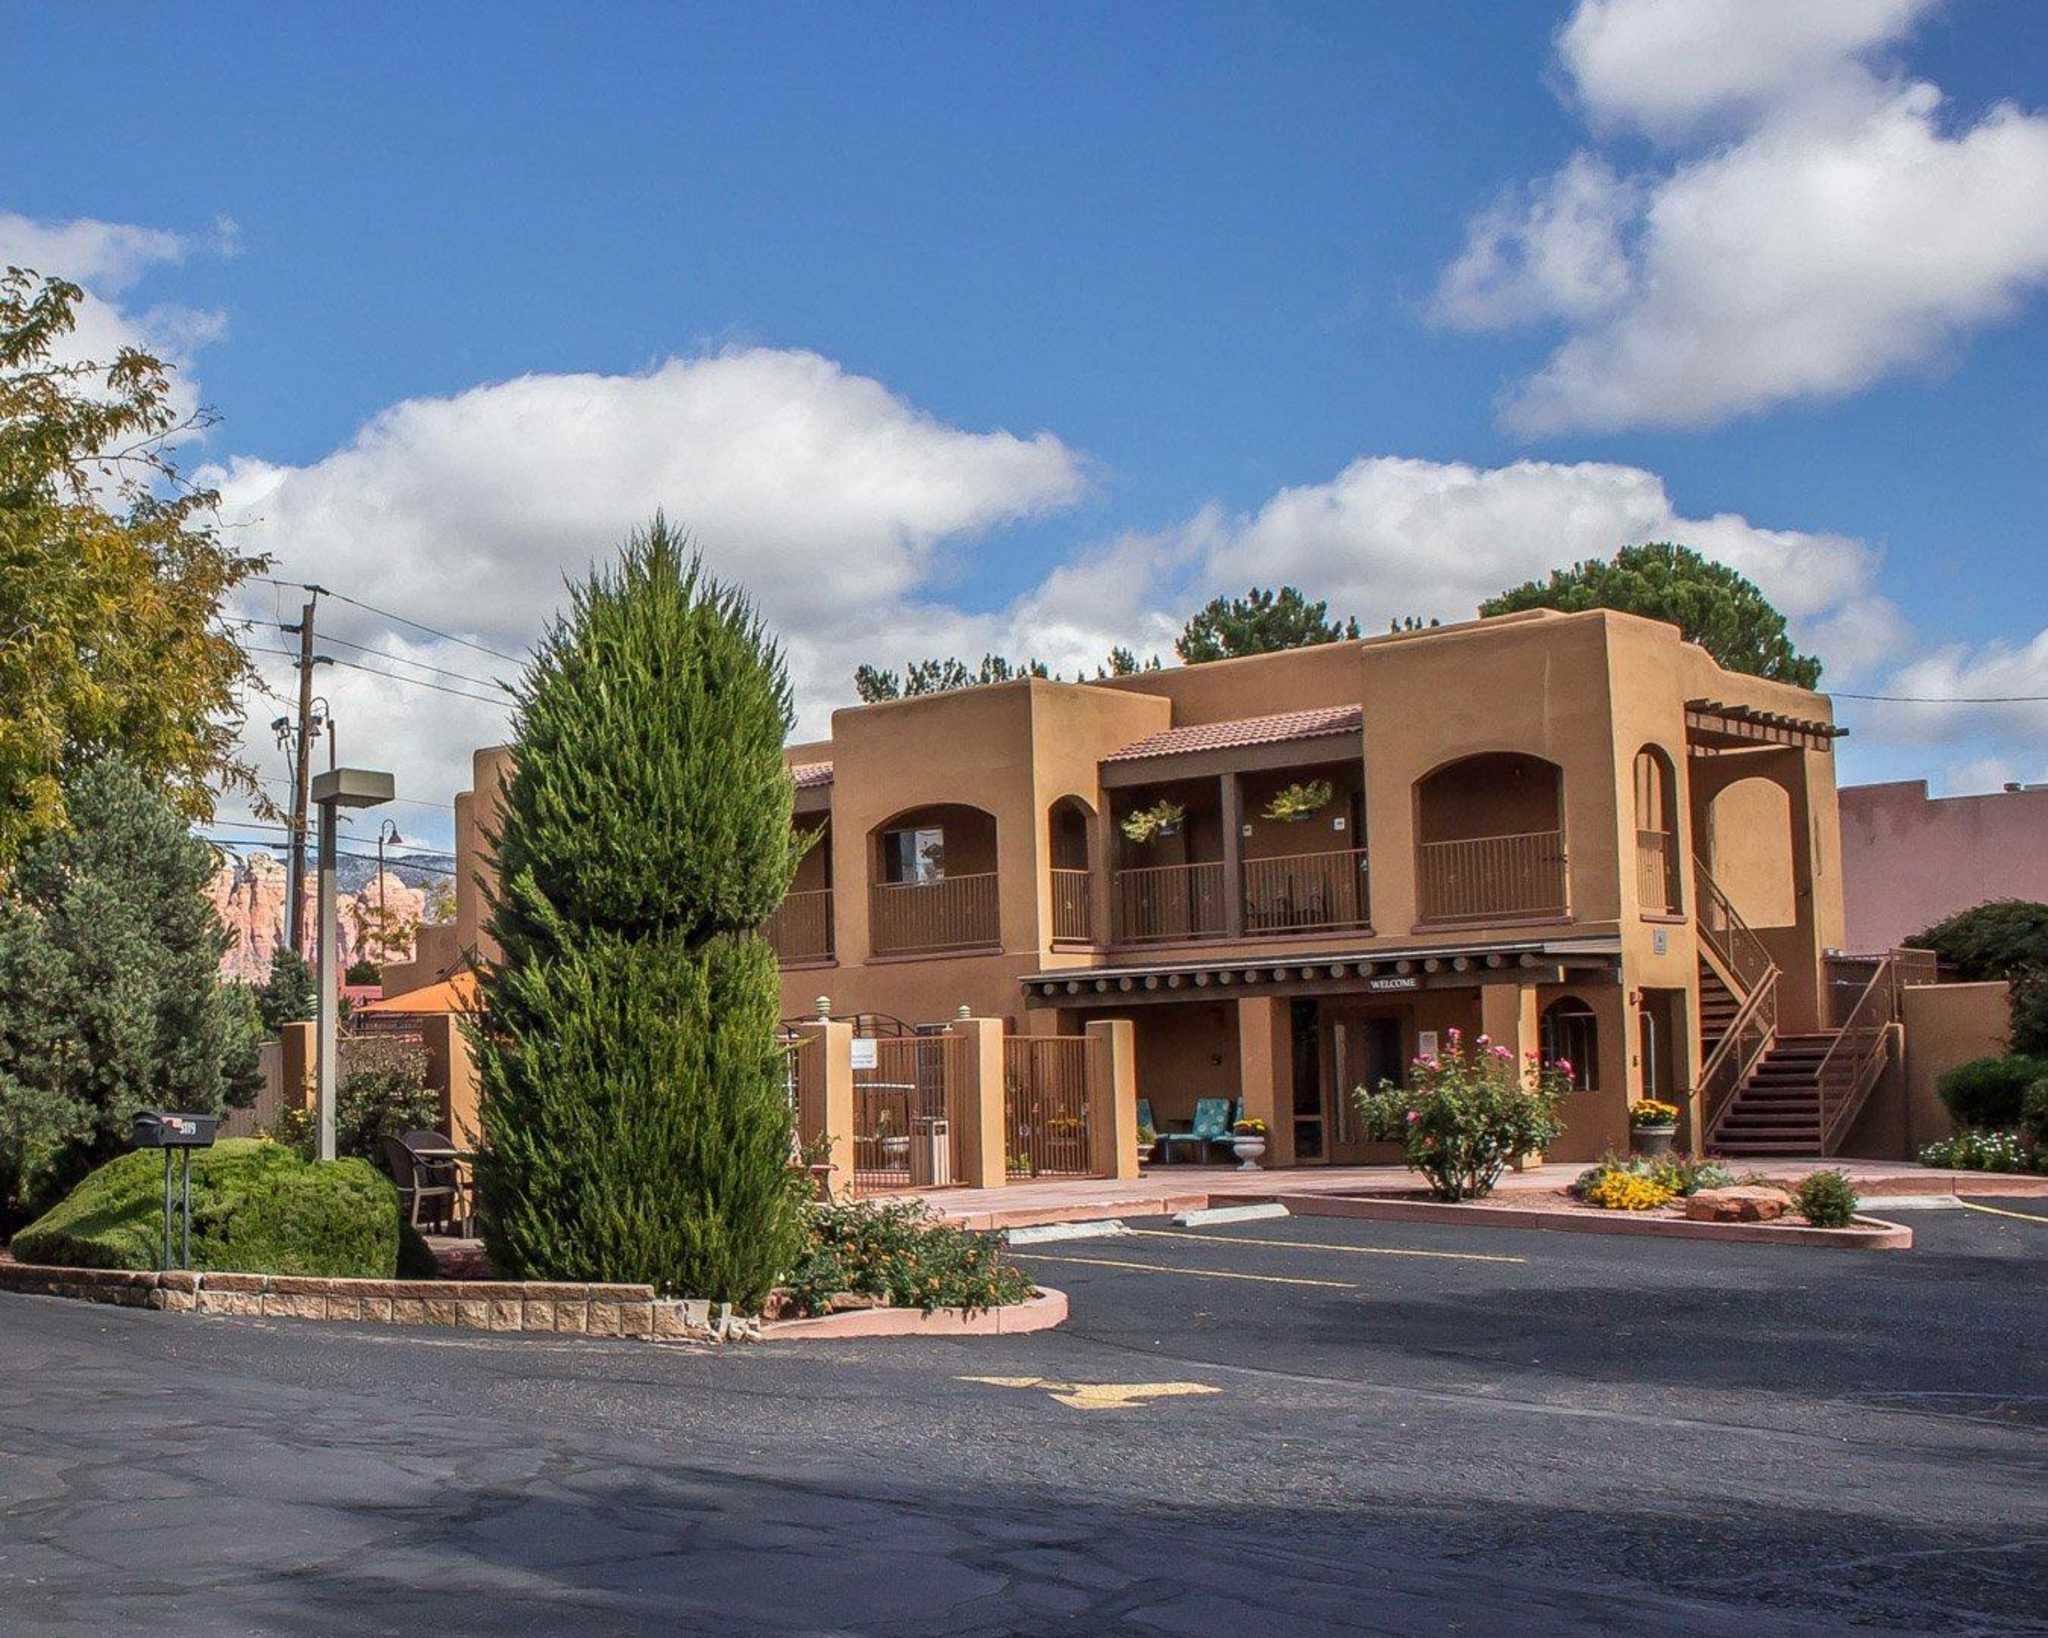 Arroyo Pinion Hotel Reviews